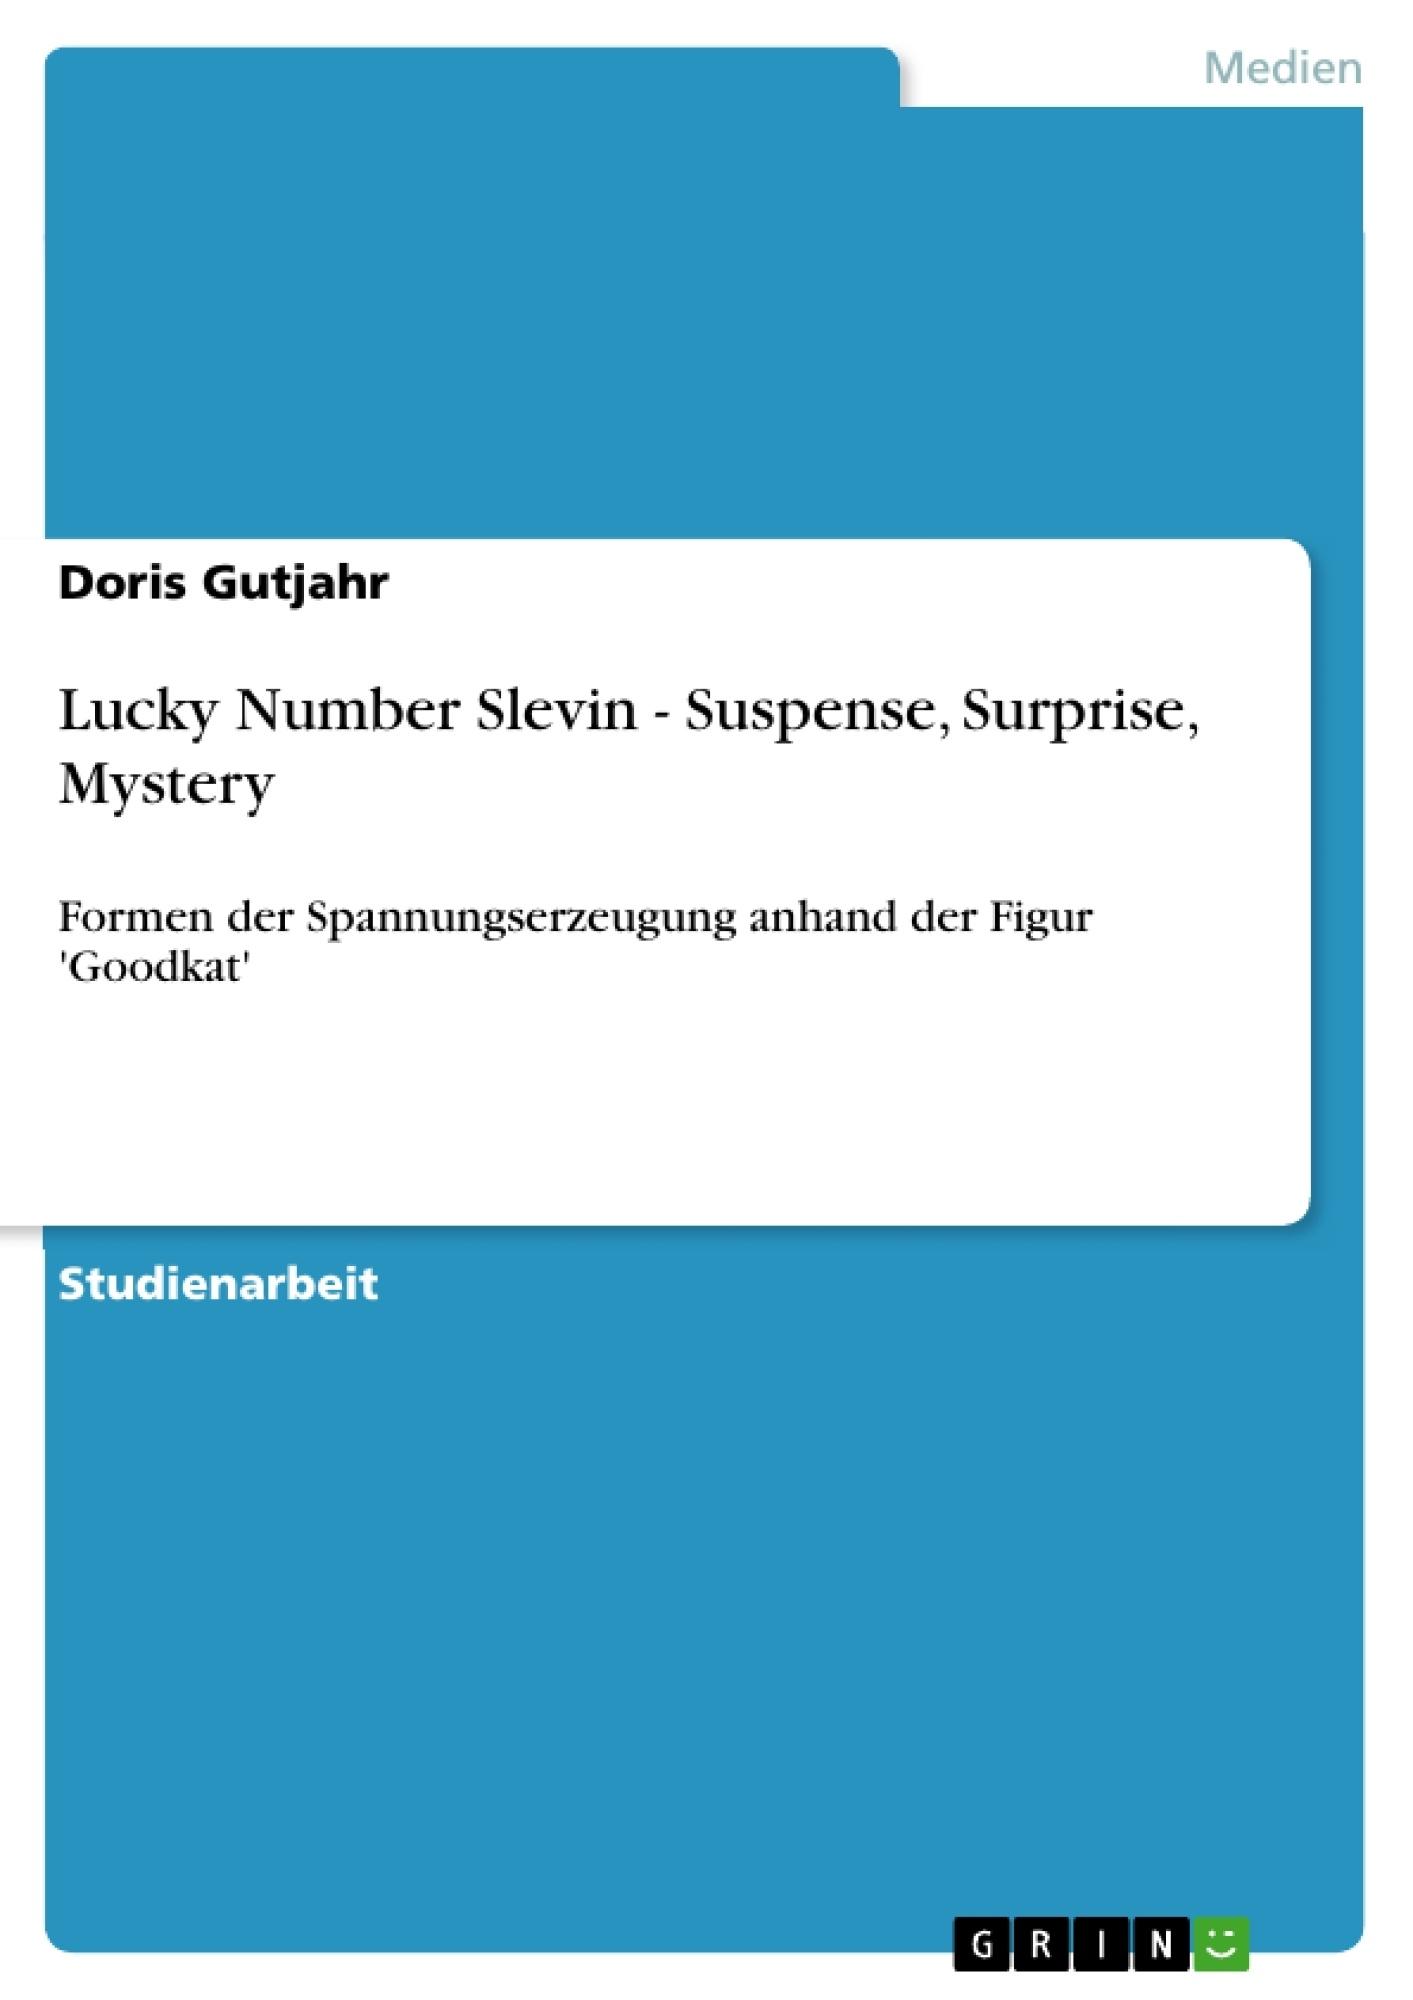 Titel: Lucky Number Slevin - Suspense, Surprise, Mystery